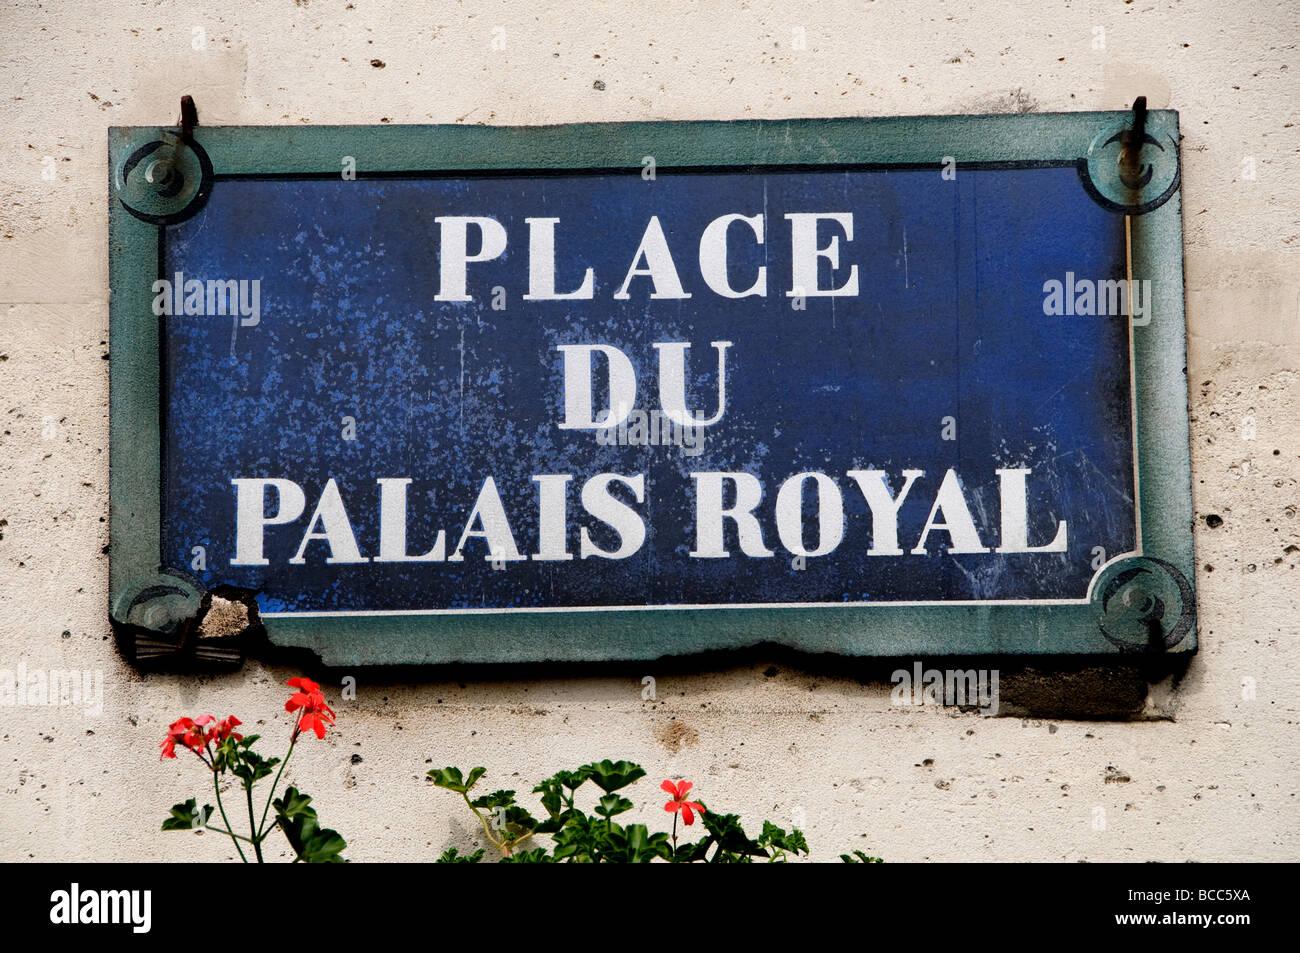 Place du Palais Royal Paris France Street Sign French City Town - Stock Image